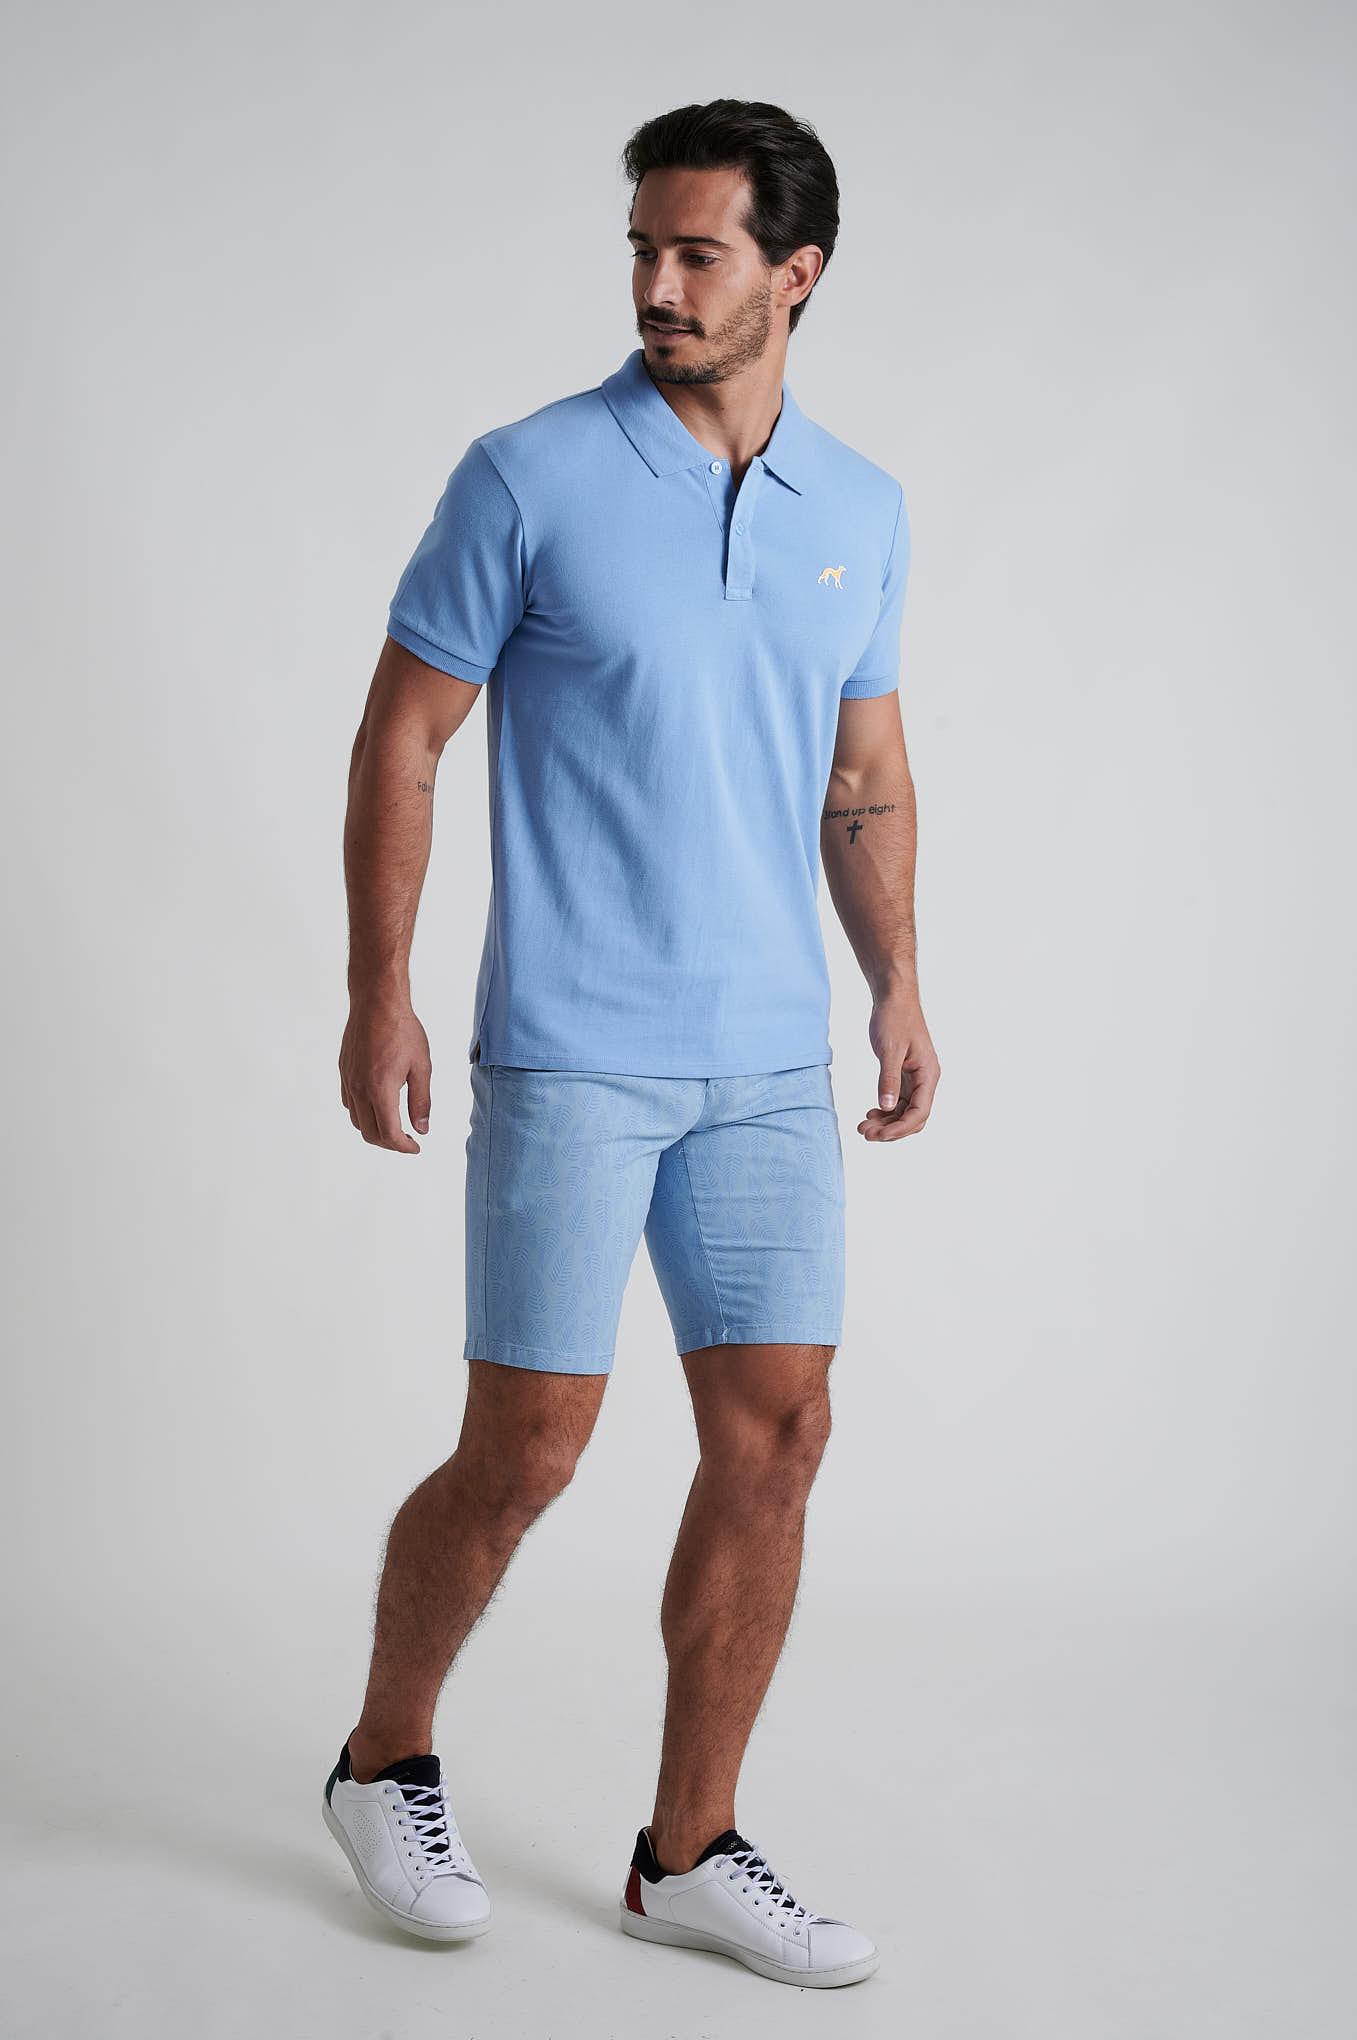 Bermuda Blue Casual Man